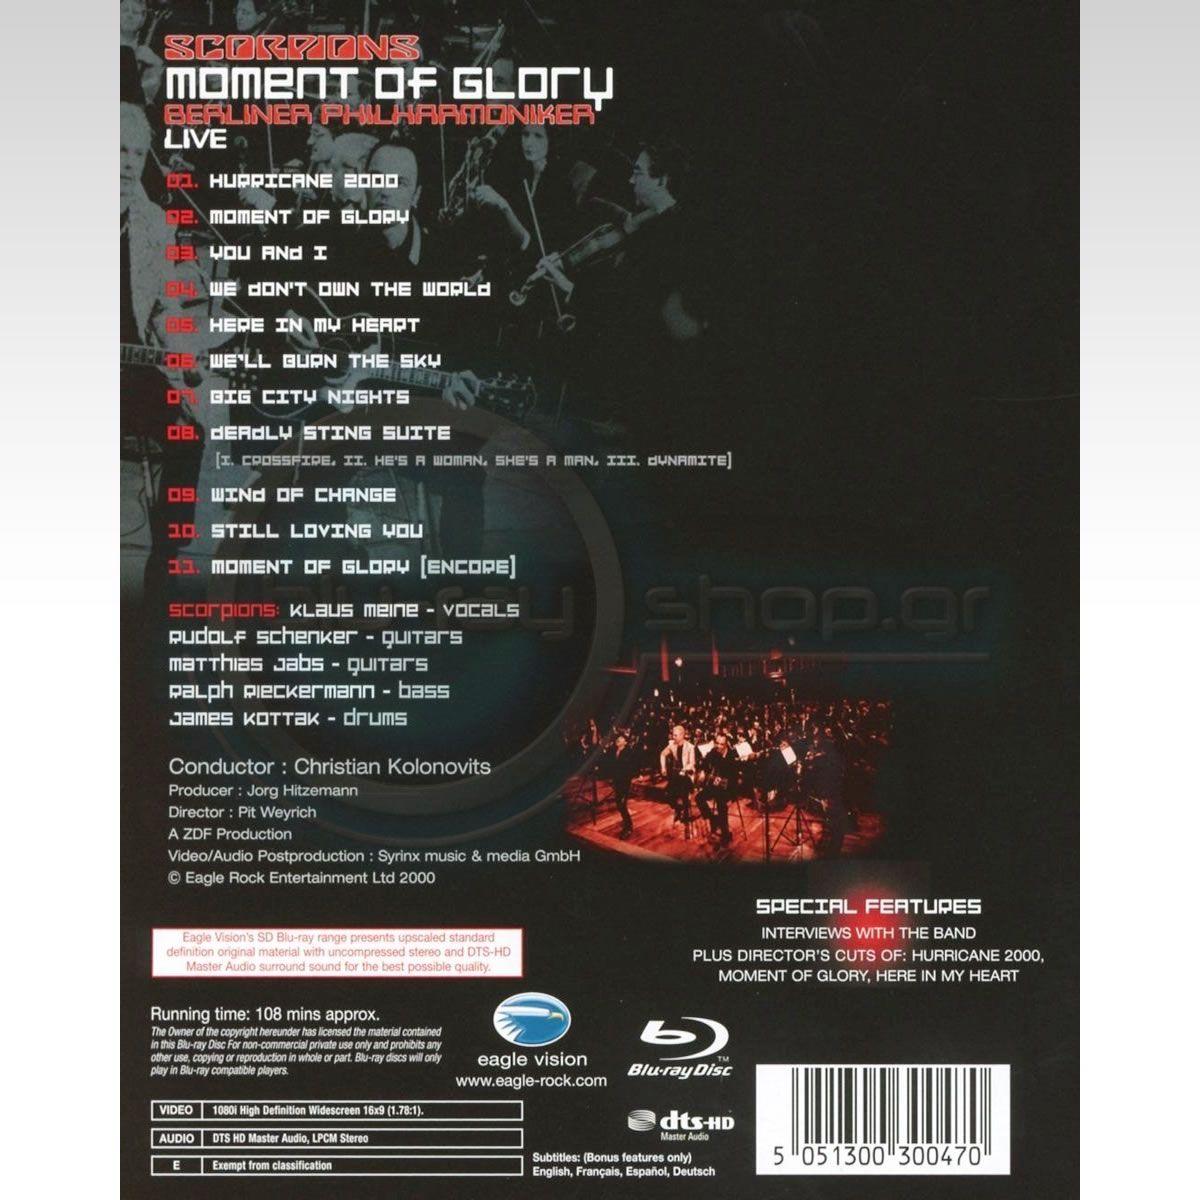 SCORPIONS: MOMENT OF GLORY [SD UPSCALED] (BLU-RAY) | HD-shop gr